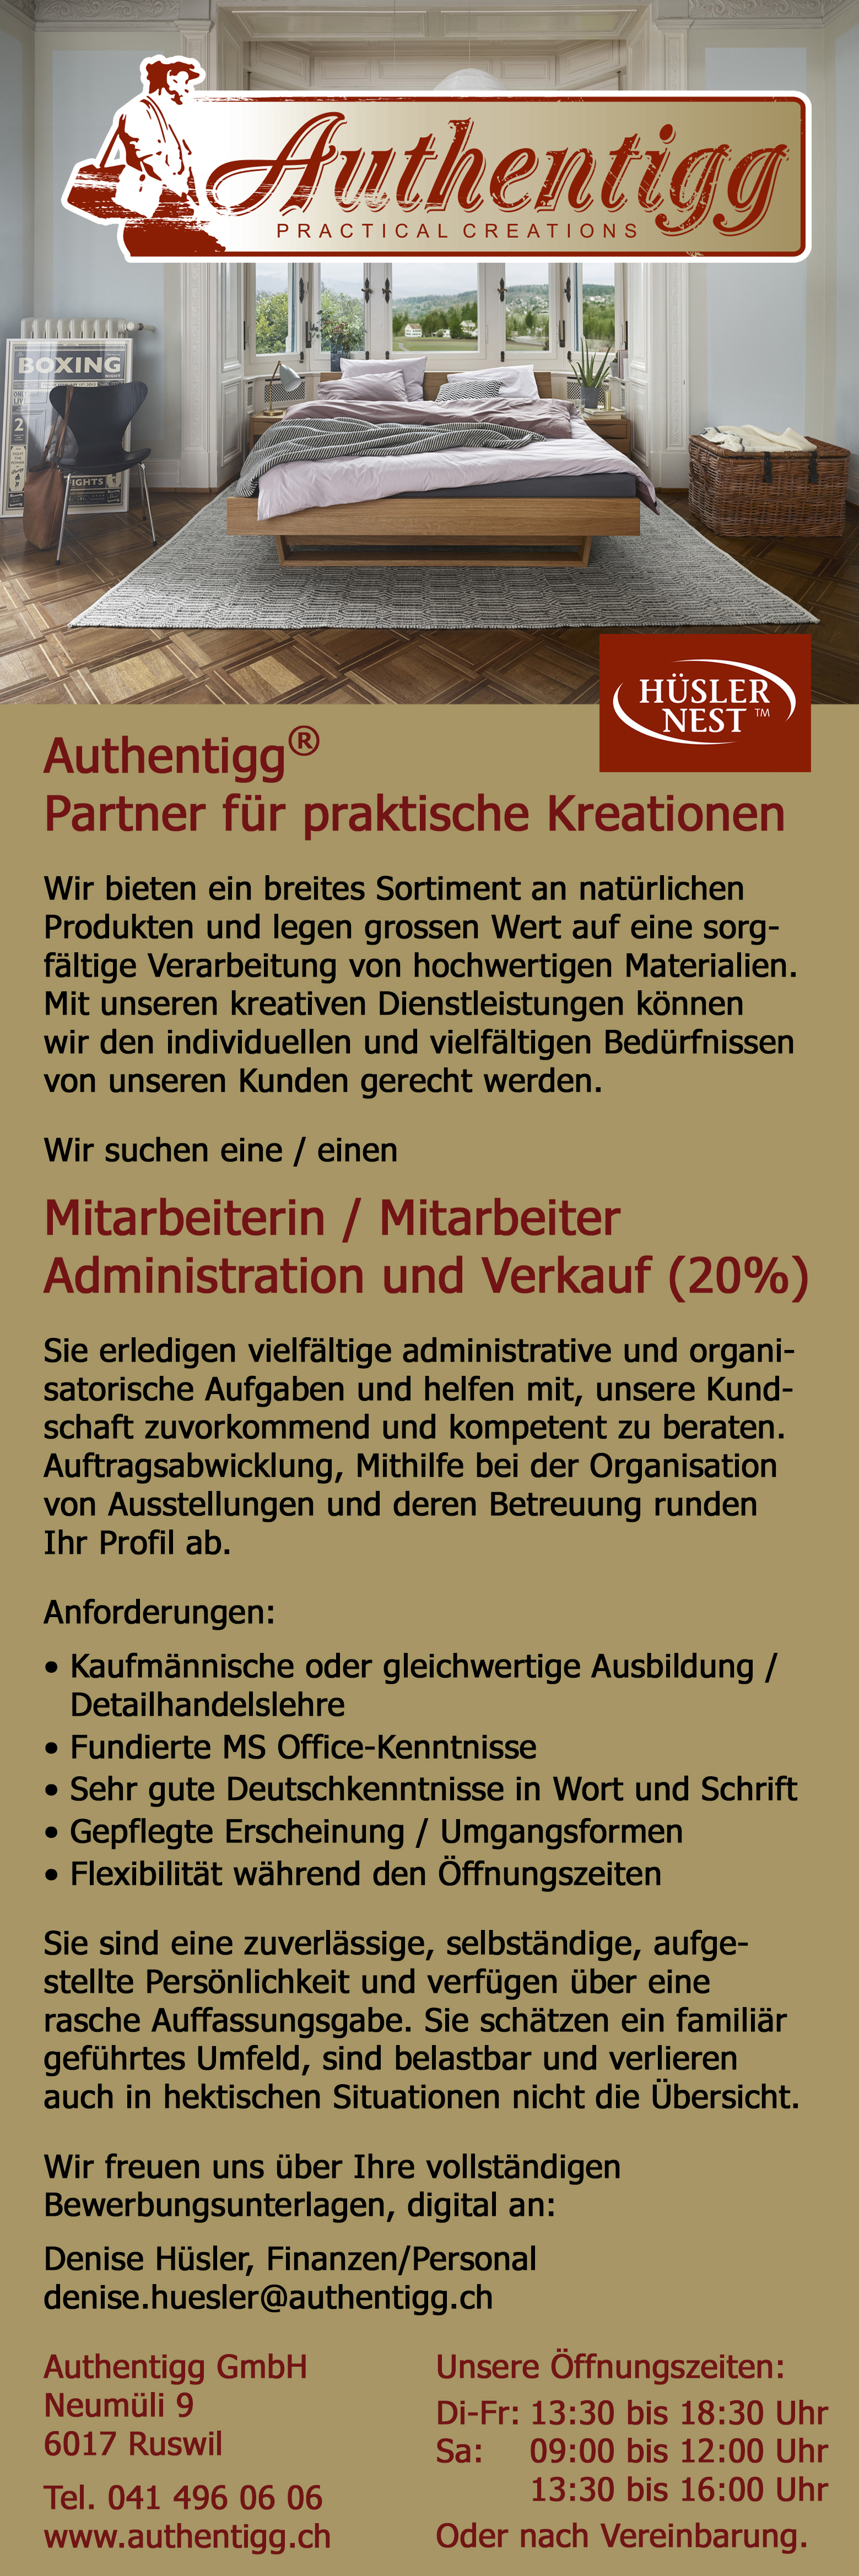 Stelleninserat, Authentigg GmbH, Ruswil, 20% Verkauf + Administration